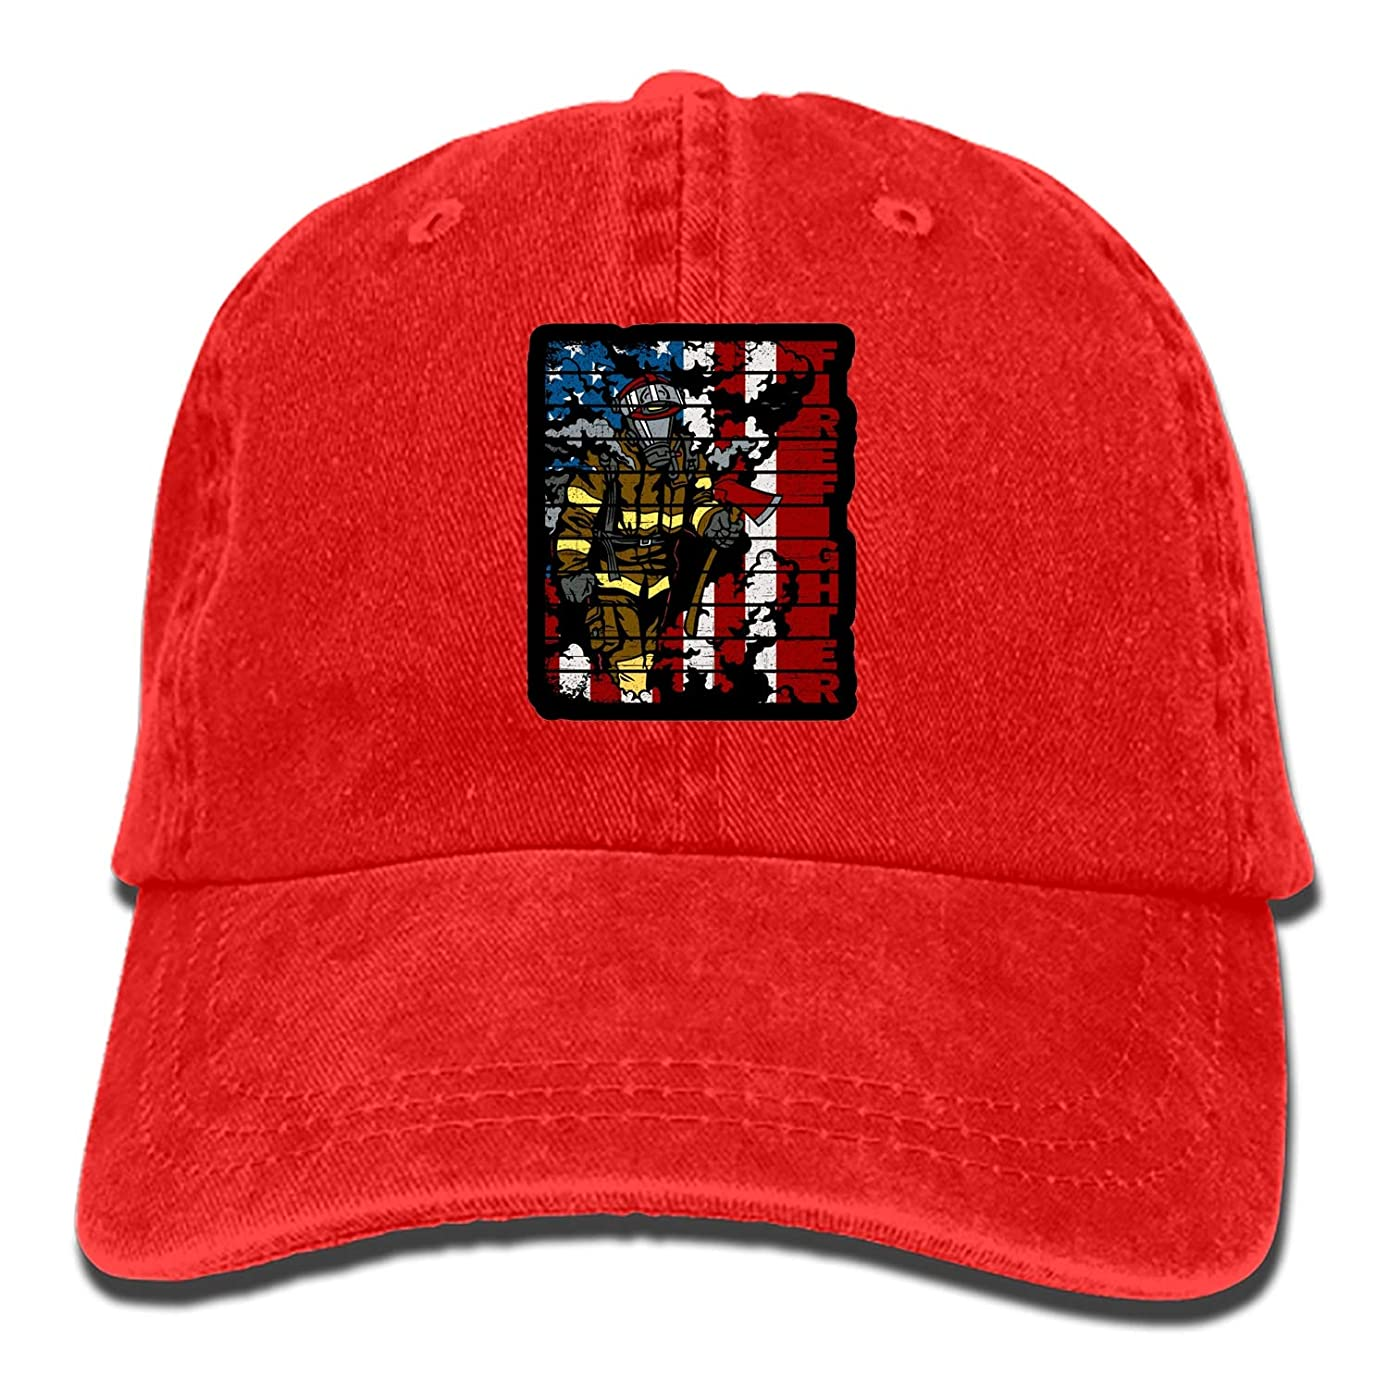 nadoab African Animals () Plain Adjustable Cowboy Cap Denim Hat for Women and Men